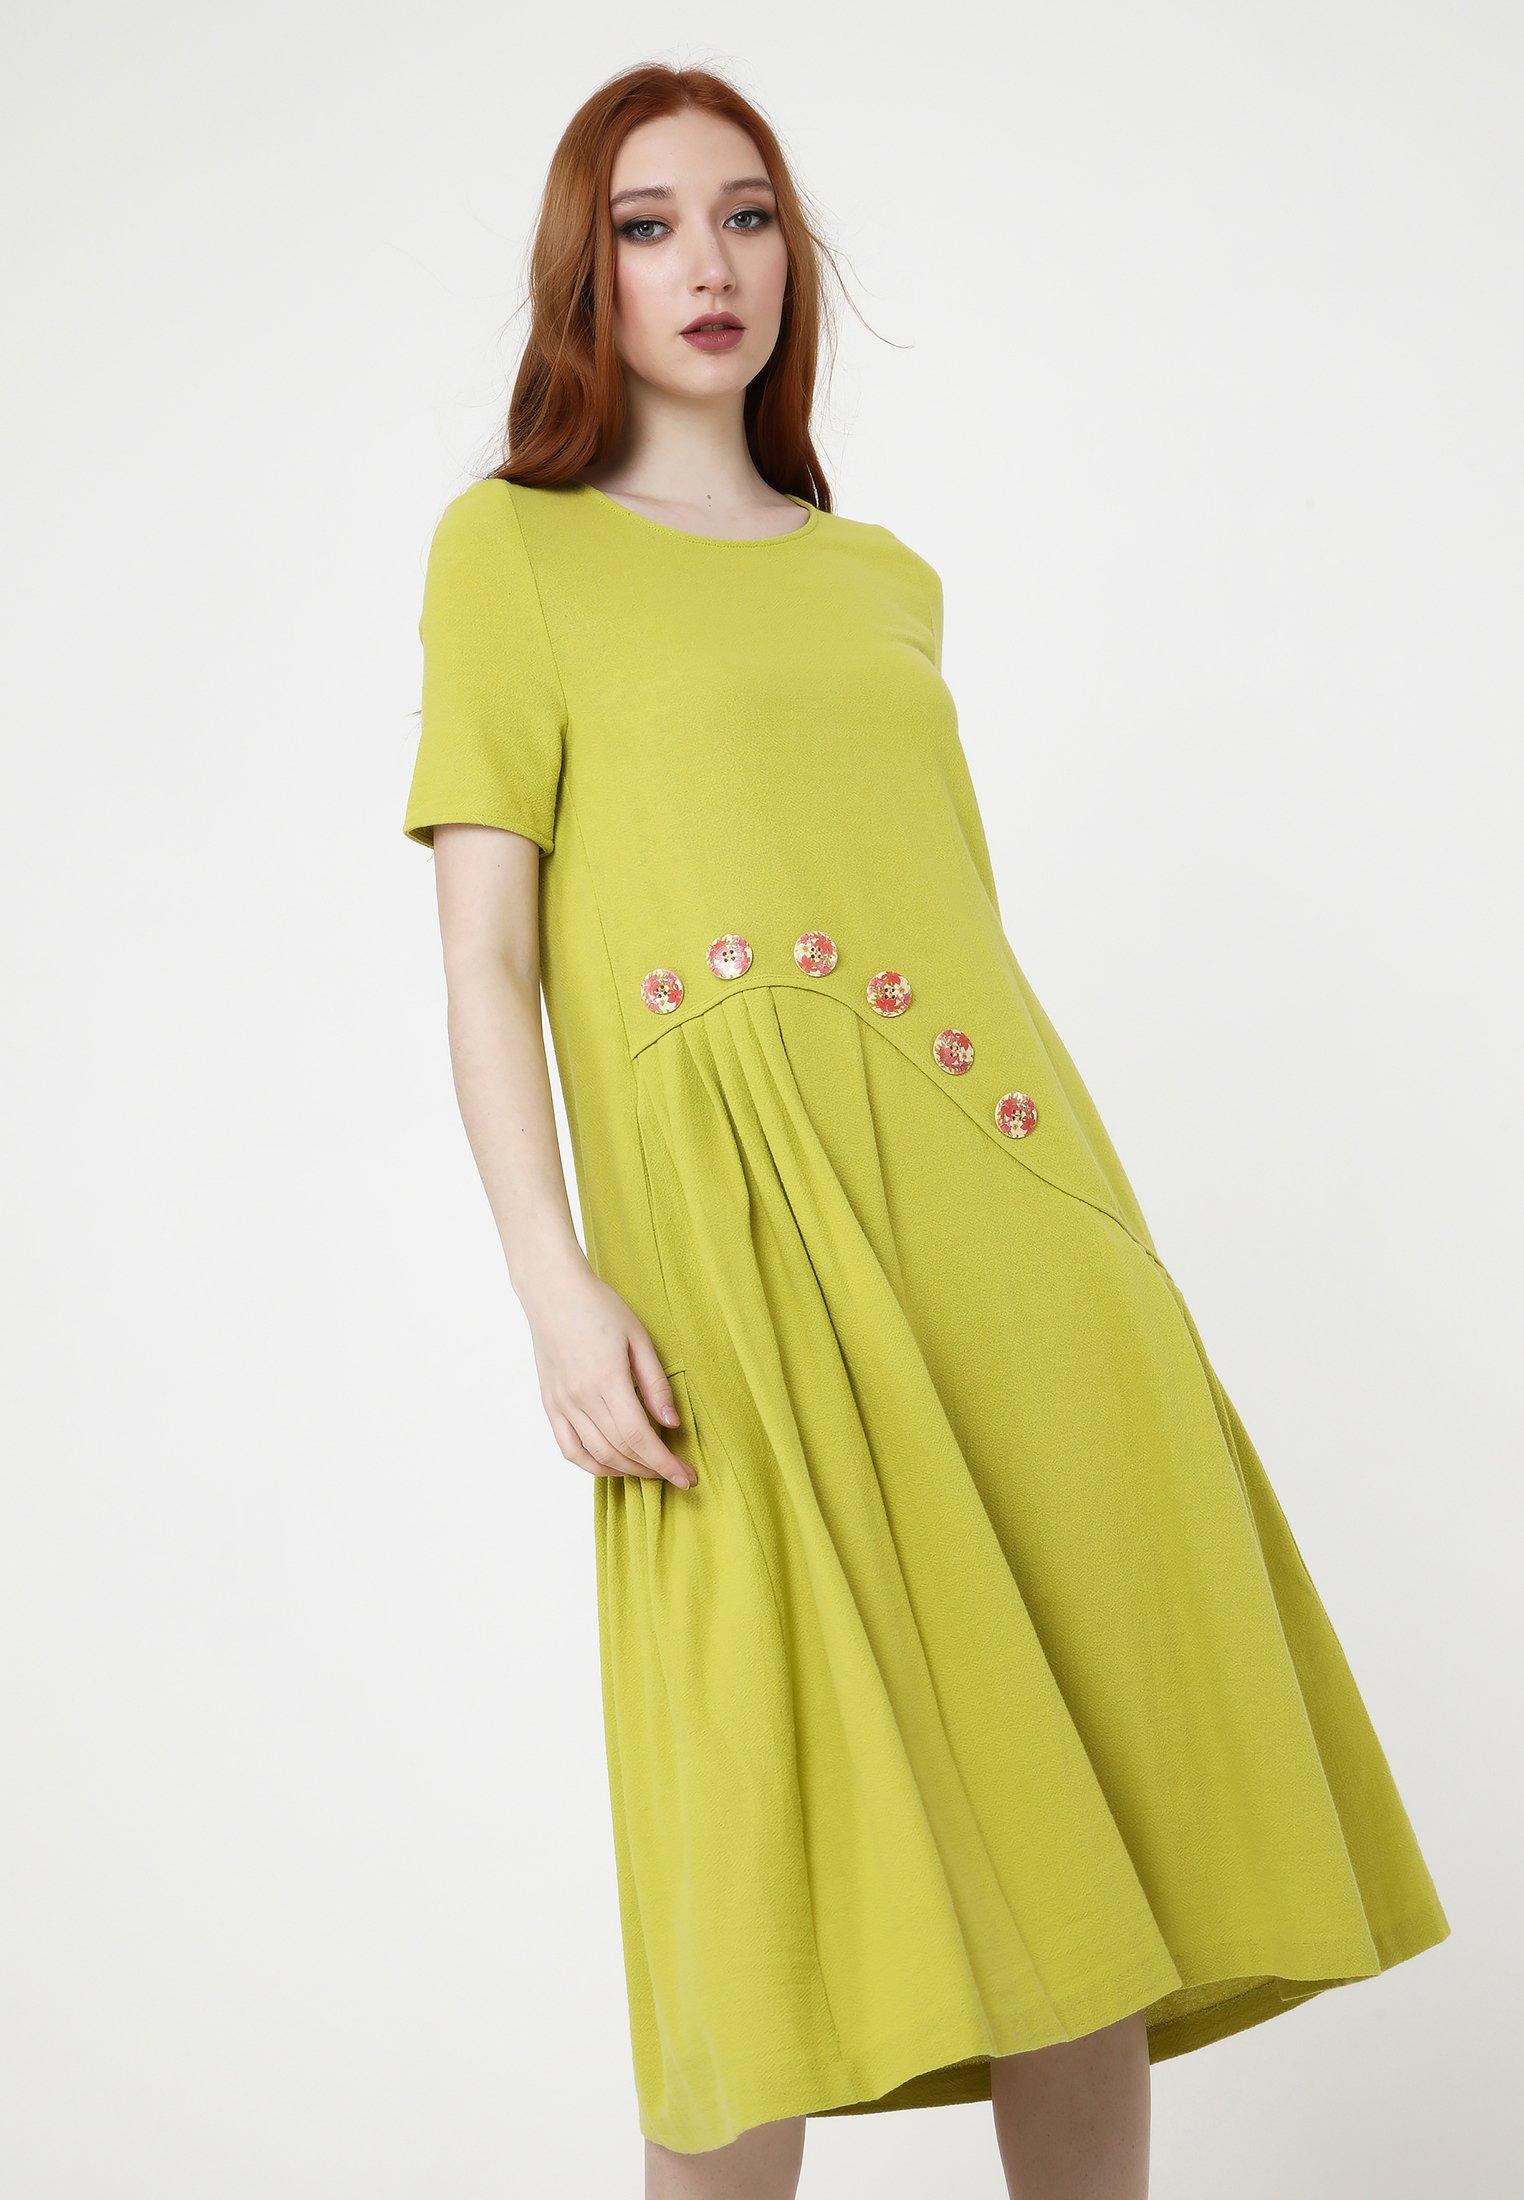 Damen SARINDA - Freizeitkleid - mustard yellow